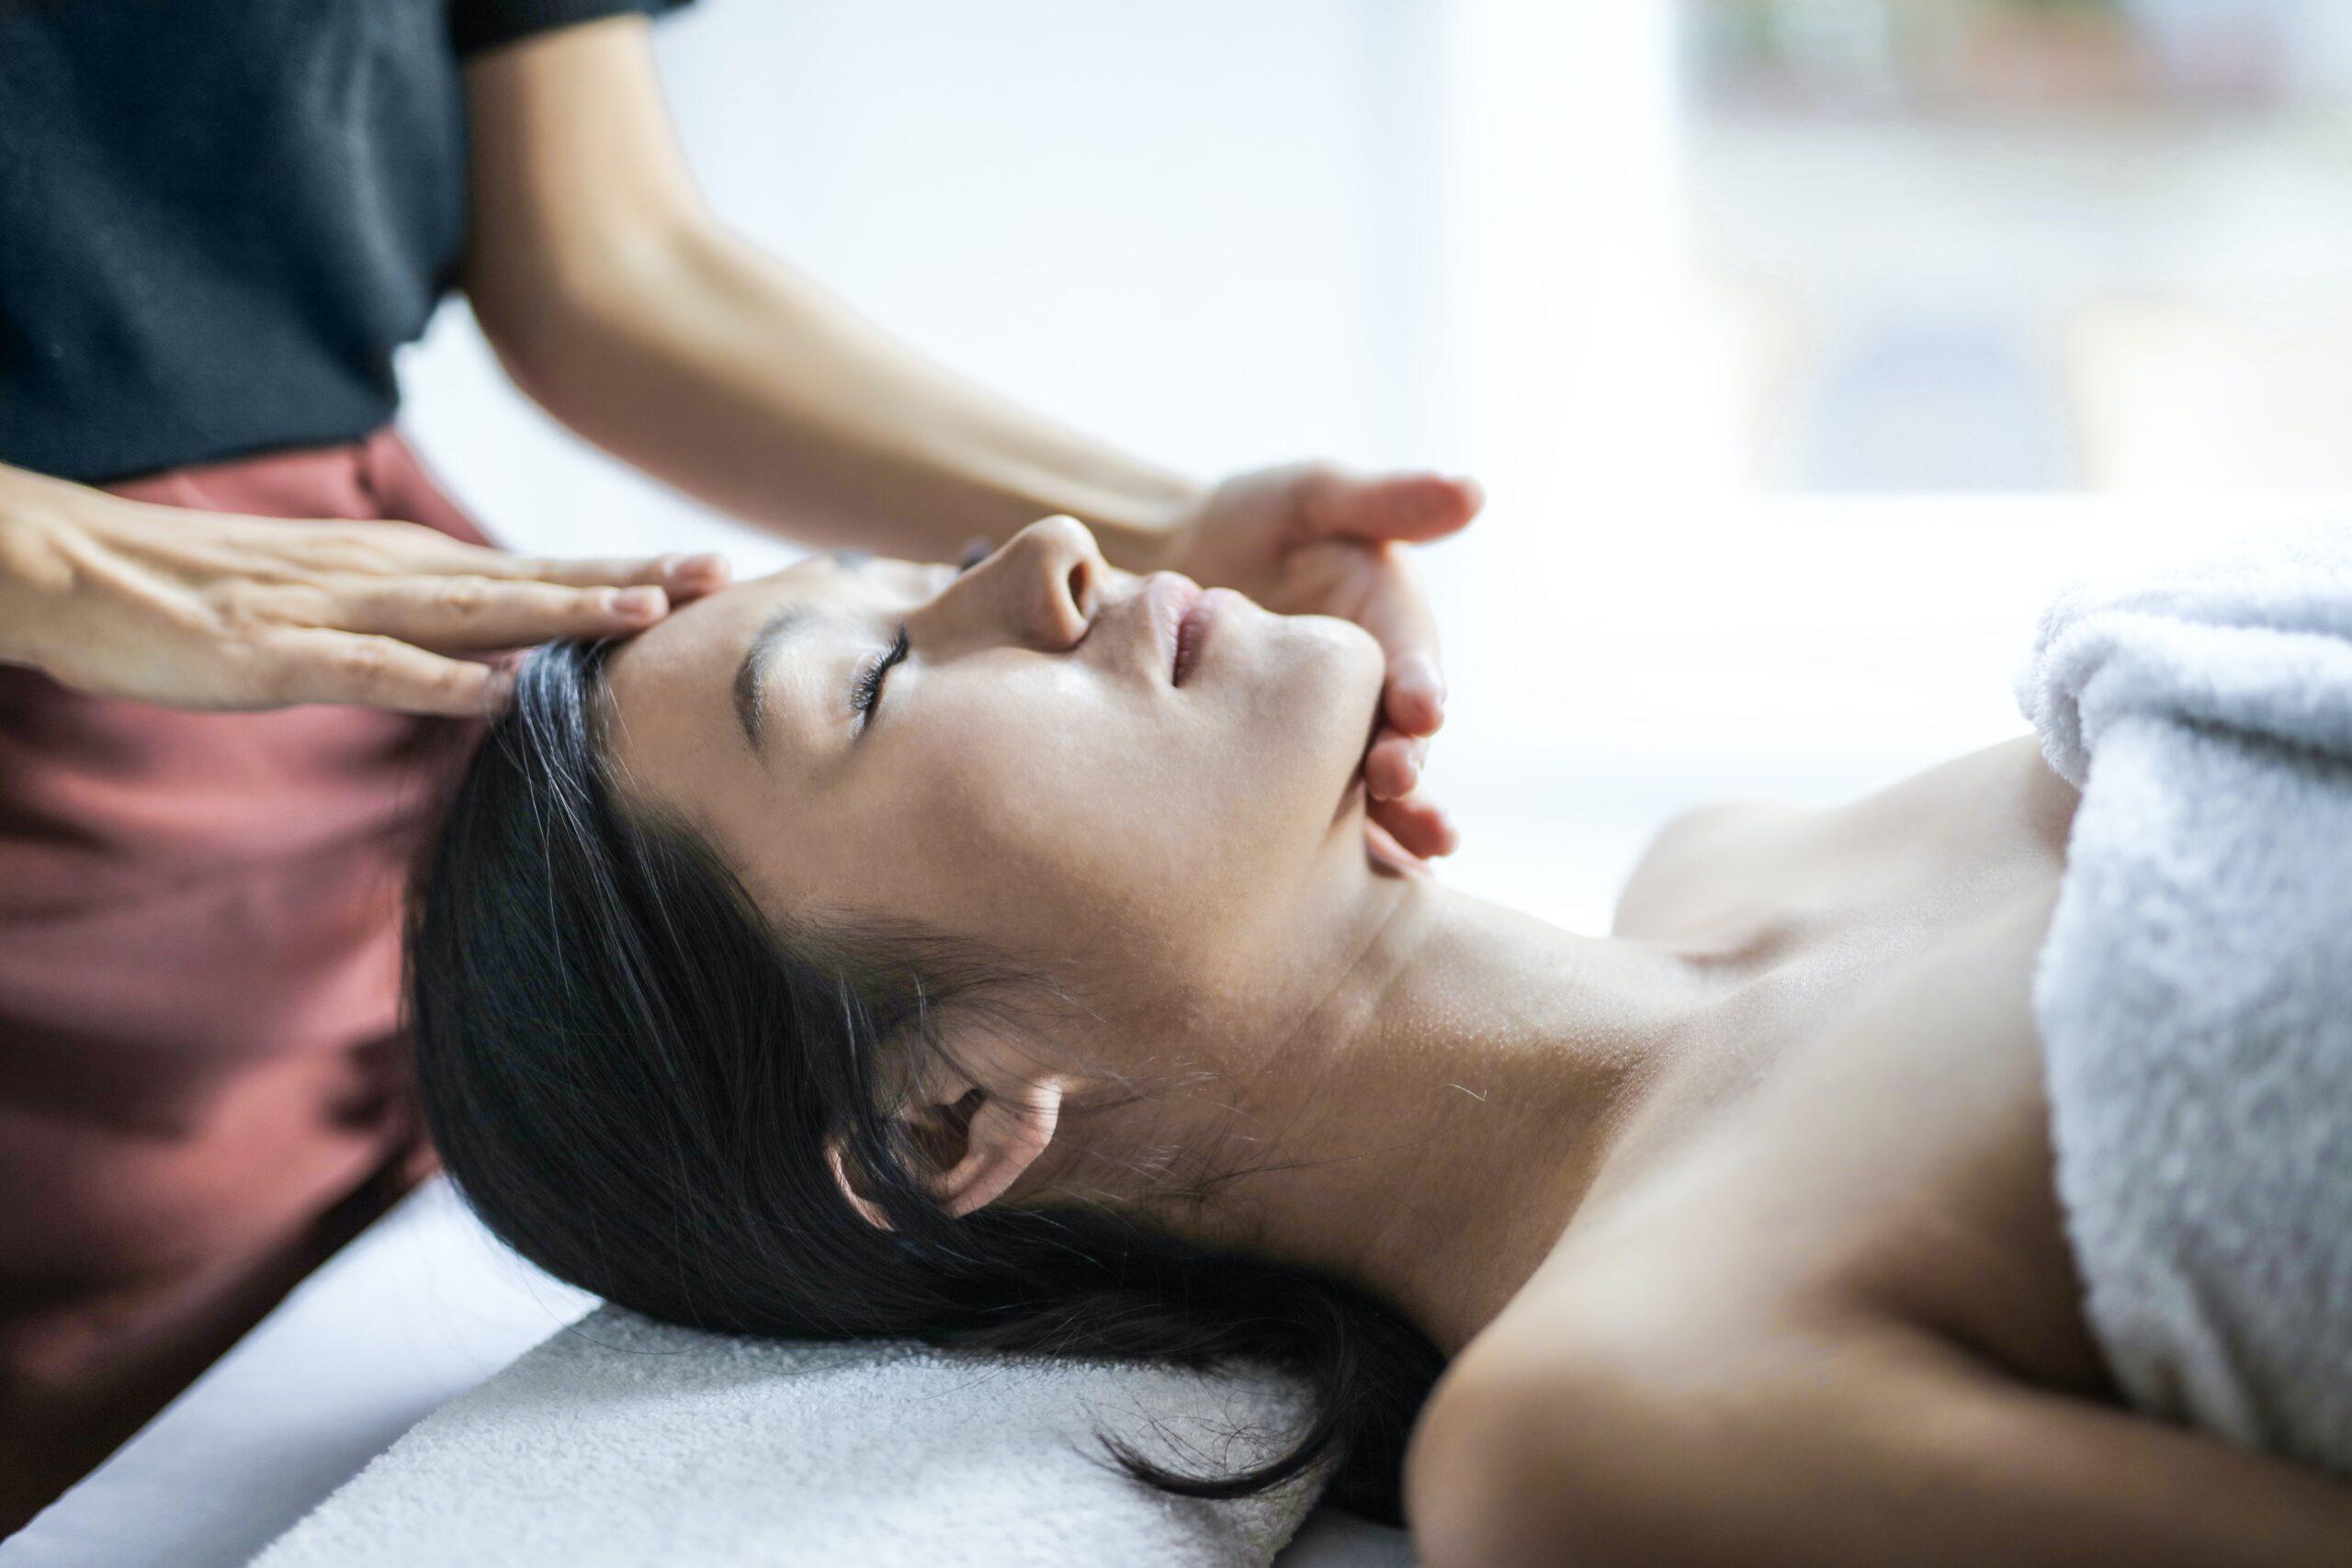 woman receiving facial massage at a spa